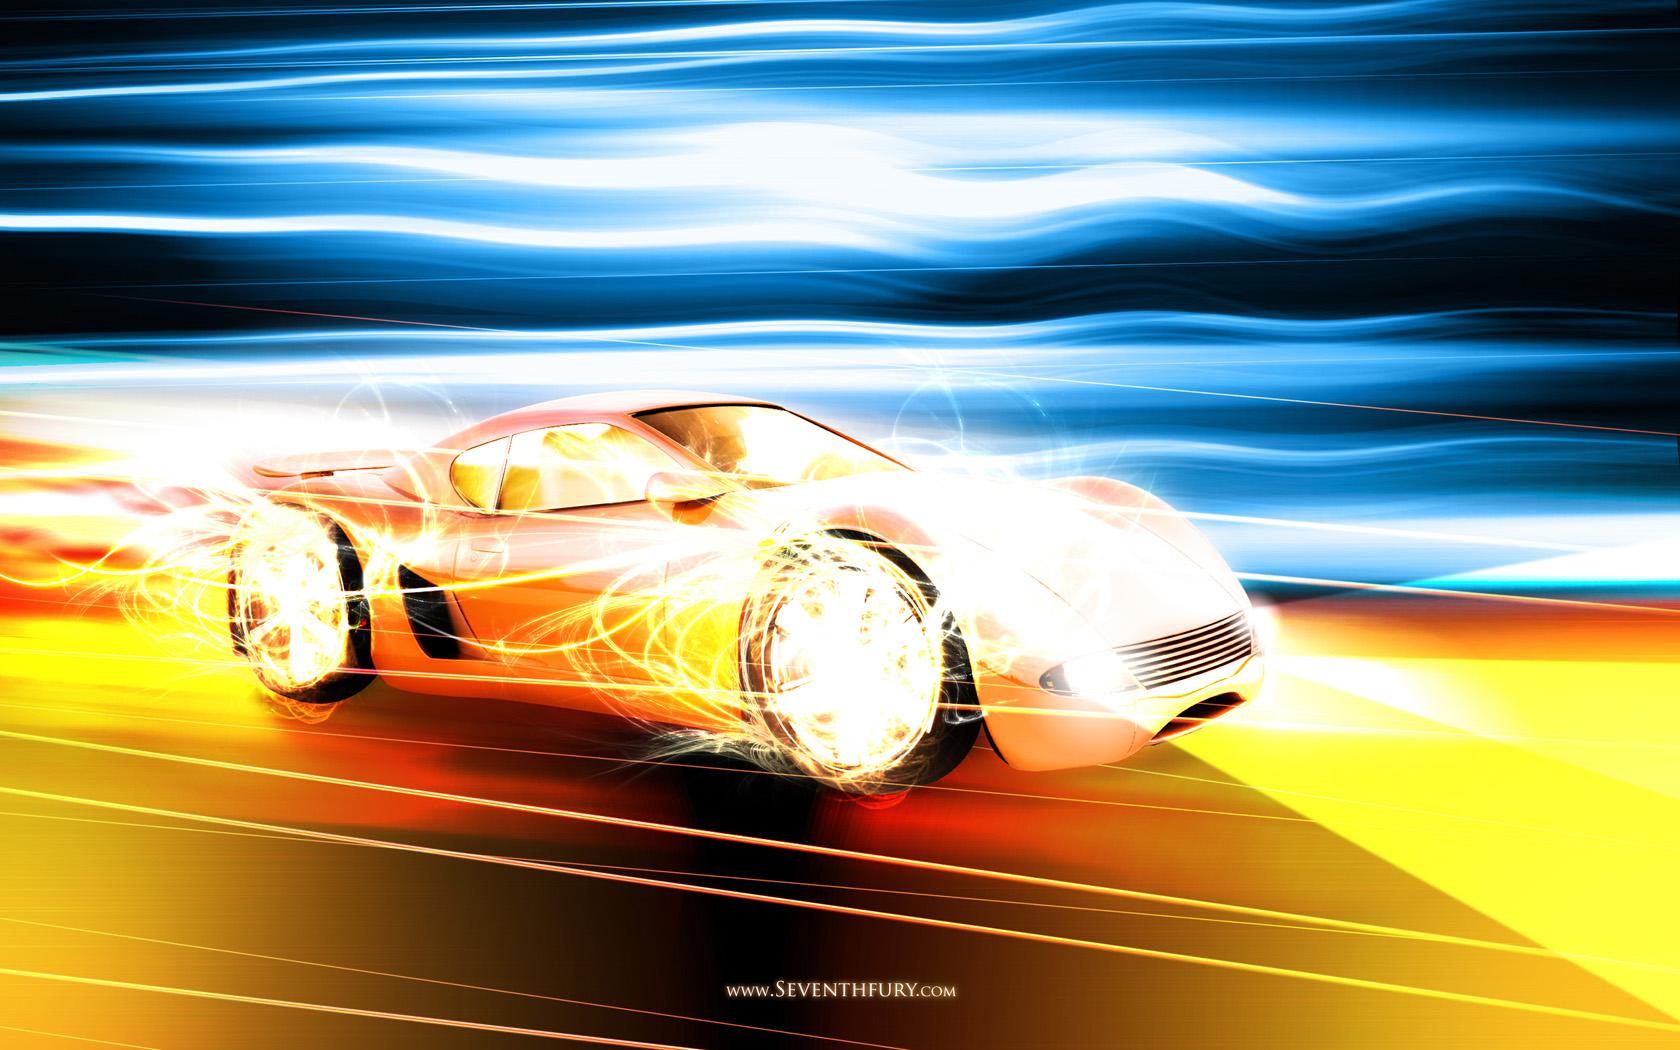 car wallpaper Stock. Date Added: 03.16.2009. Submitter: xXxJAG44xXx